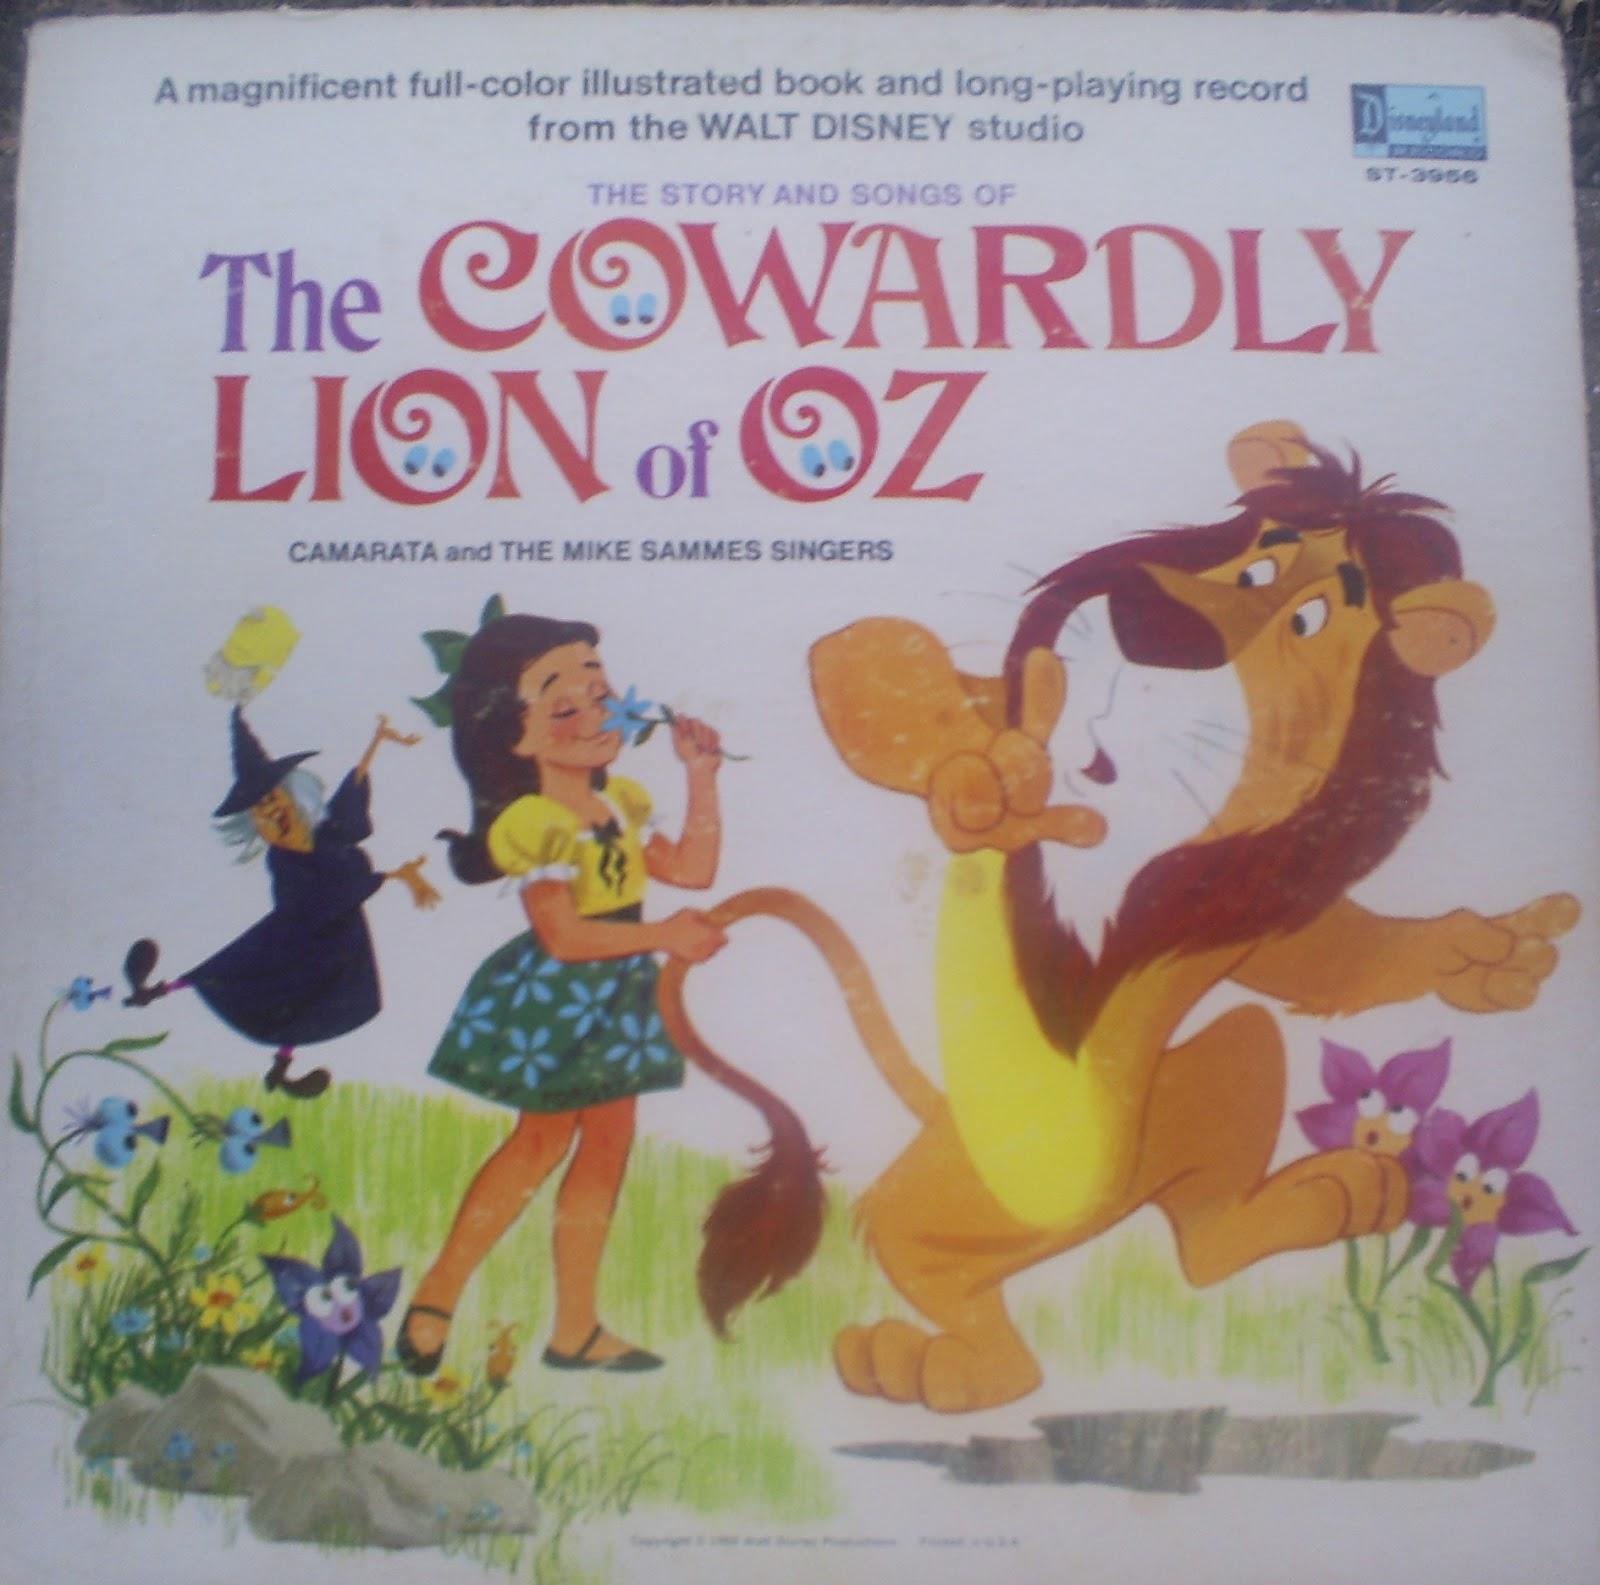 The Royal Blog Of Oz Disneyland Records Cowardly Lion